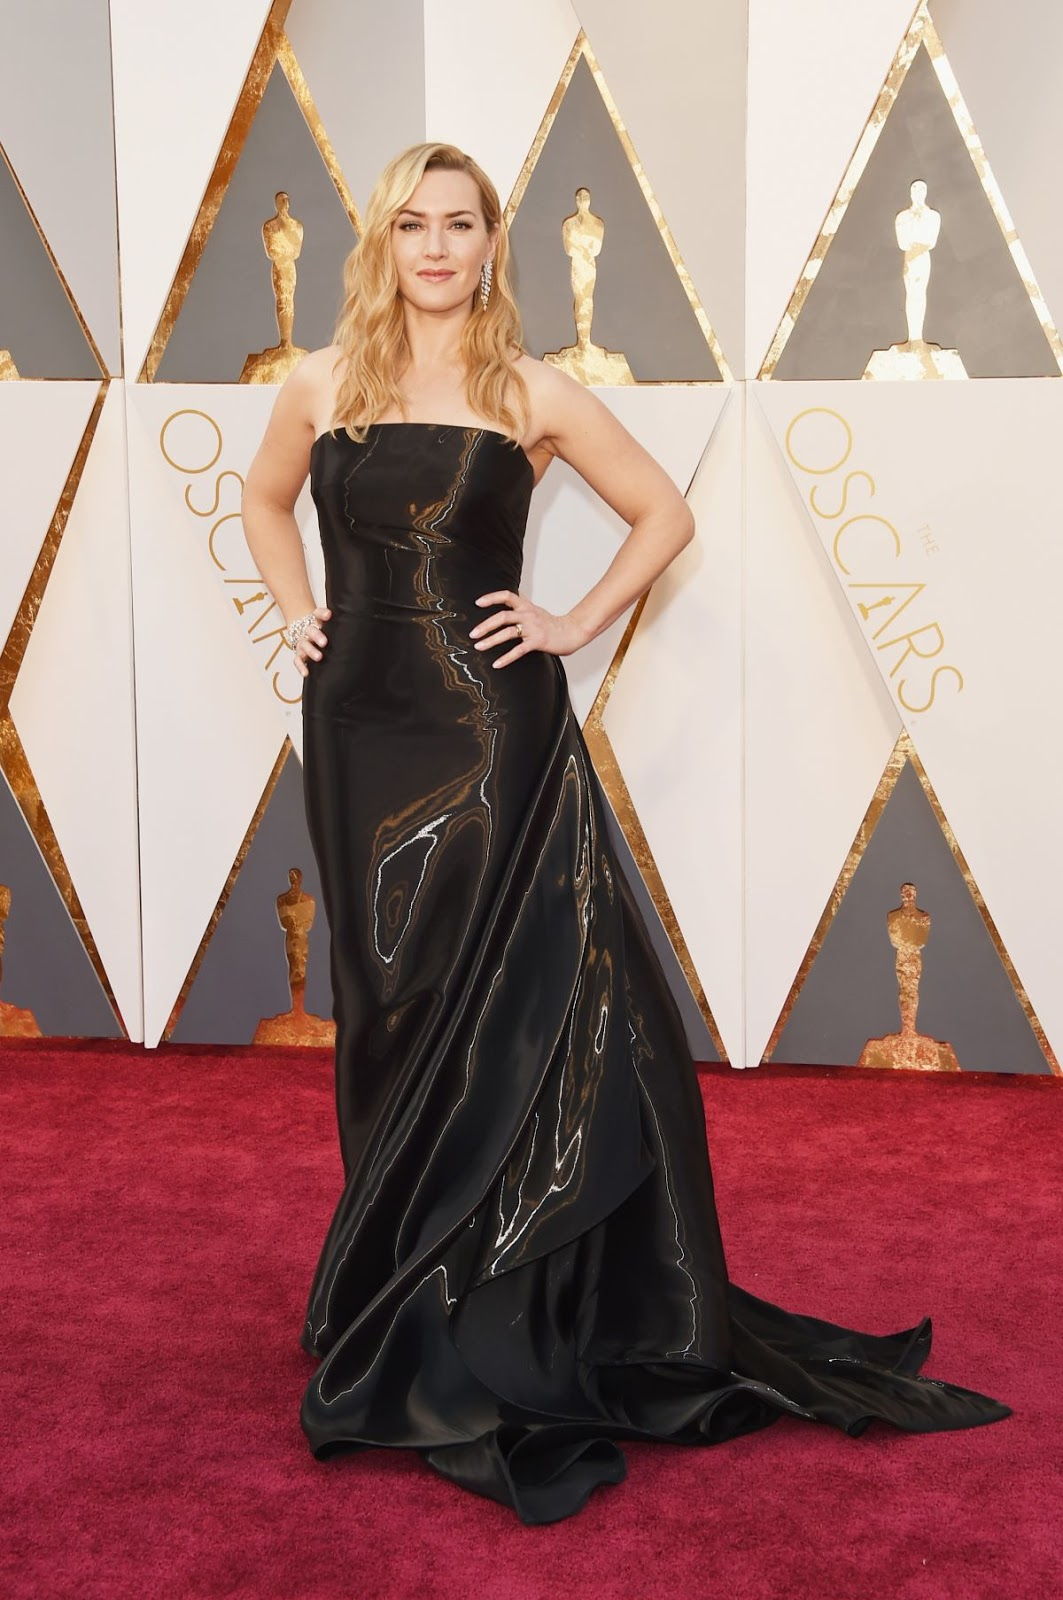 Titanic Couple Kate Winslet & Leonardo DiCaprio at 88th Annual Academy Awards HD Photos